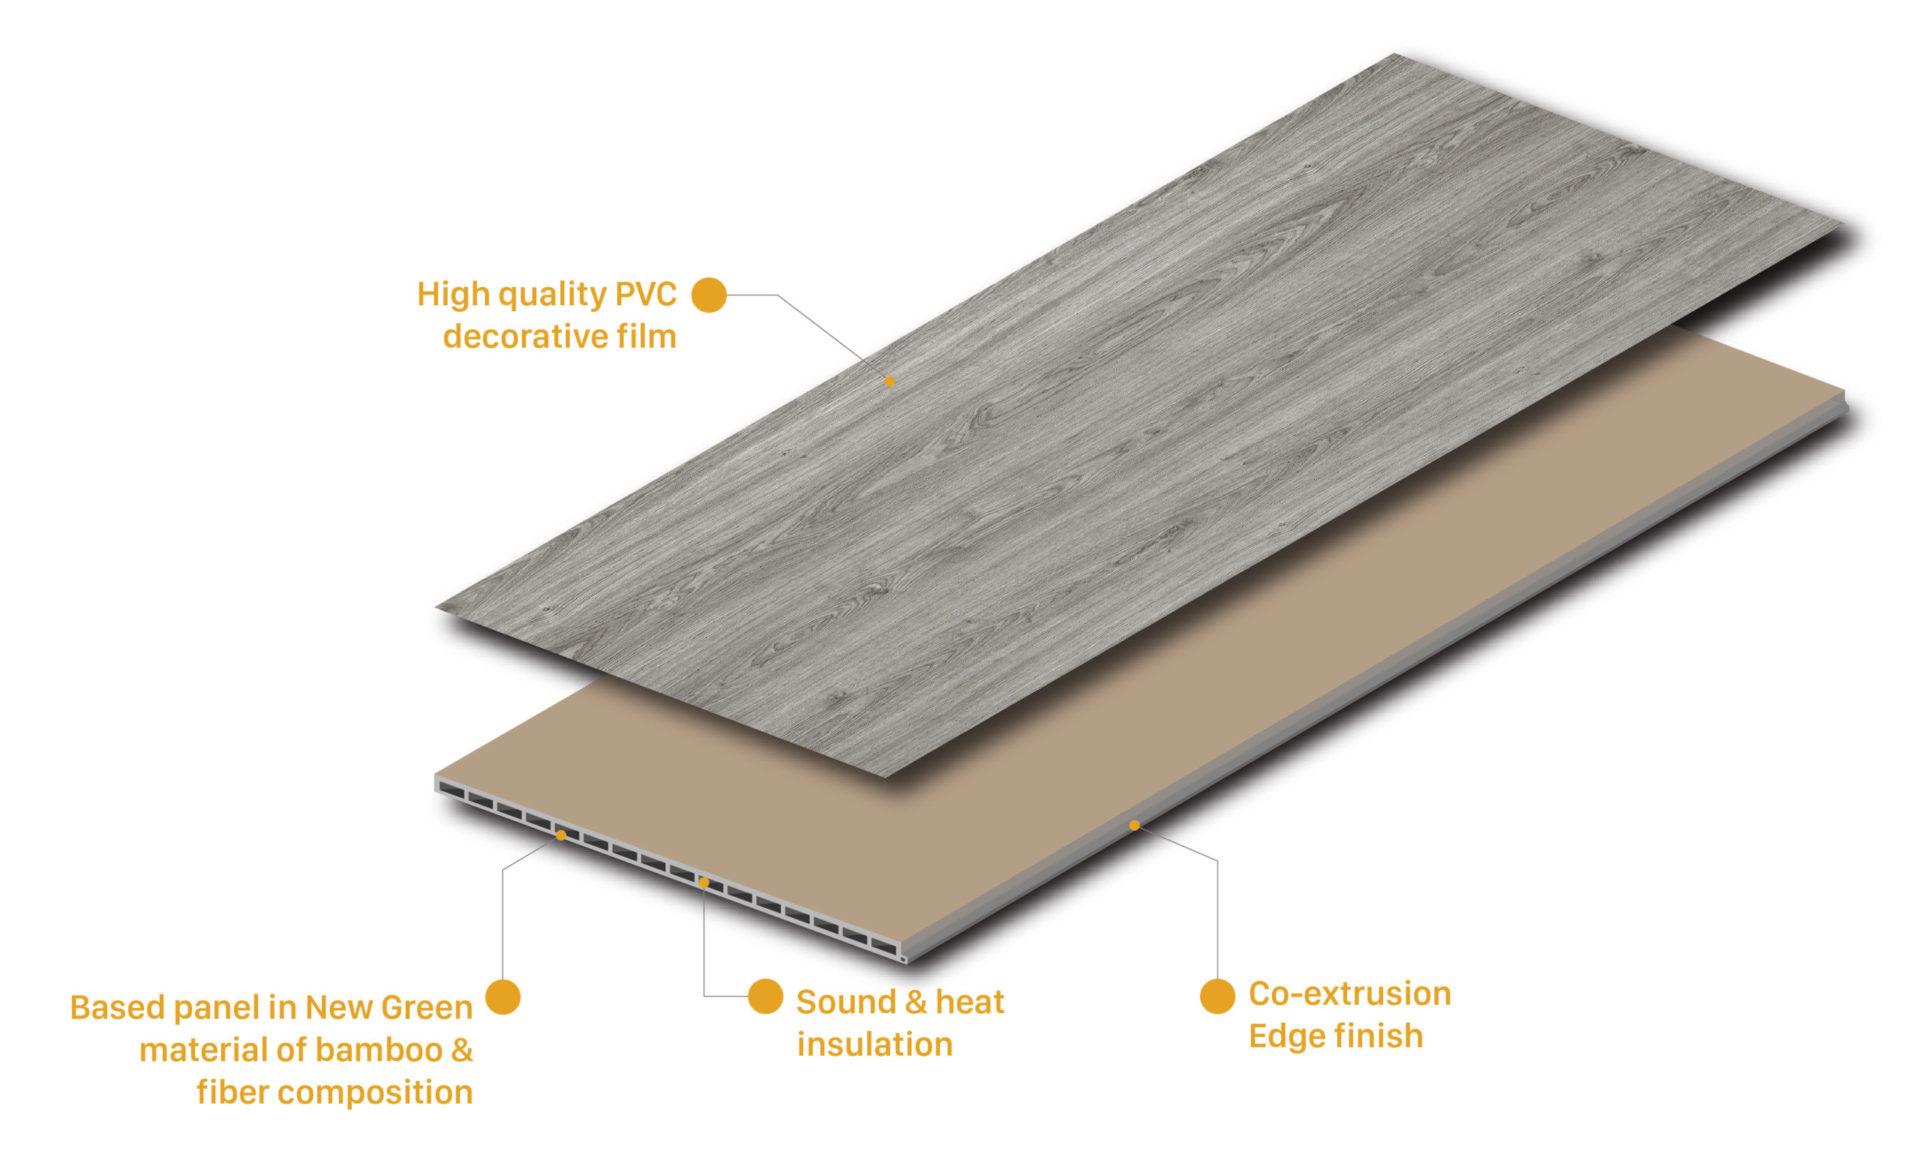 PVC Wall Panels 01 scaled - PVC wall panel